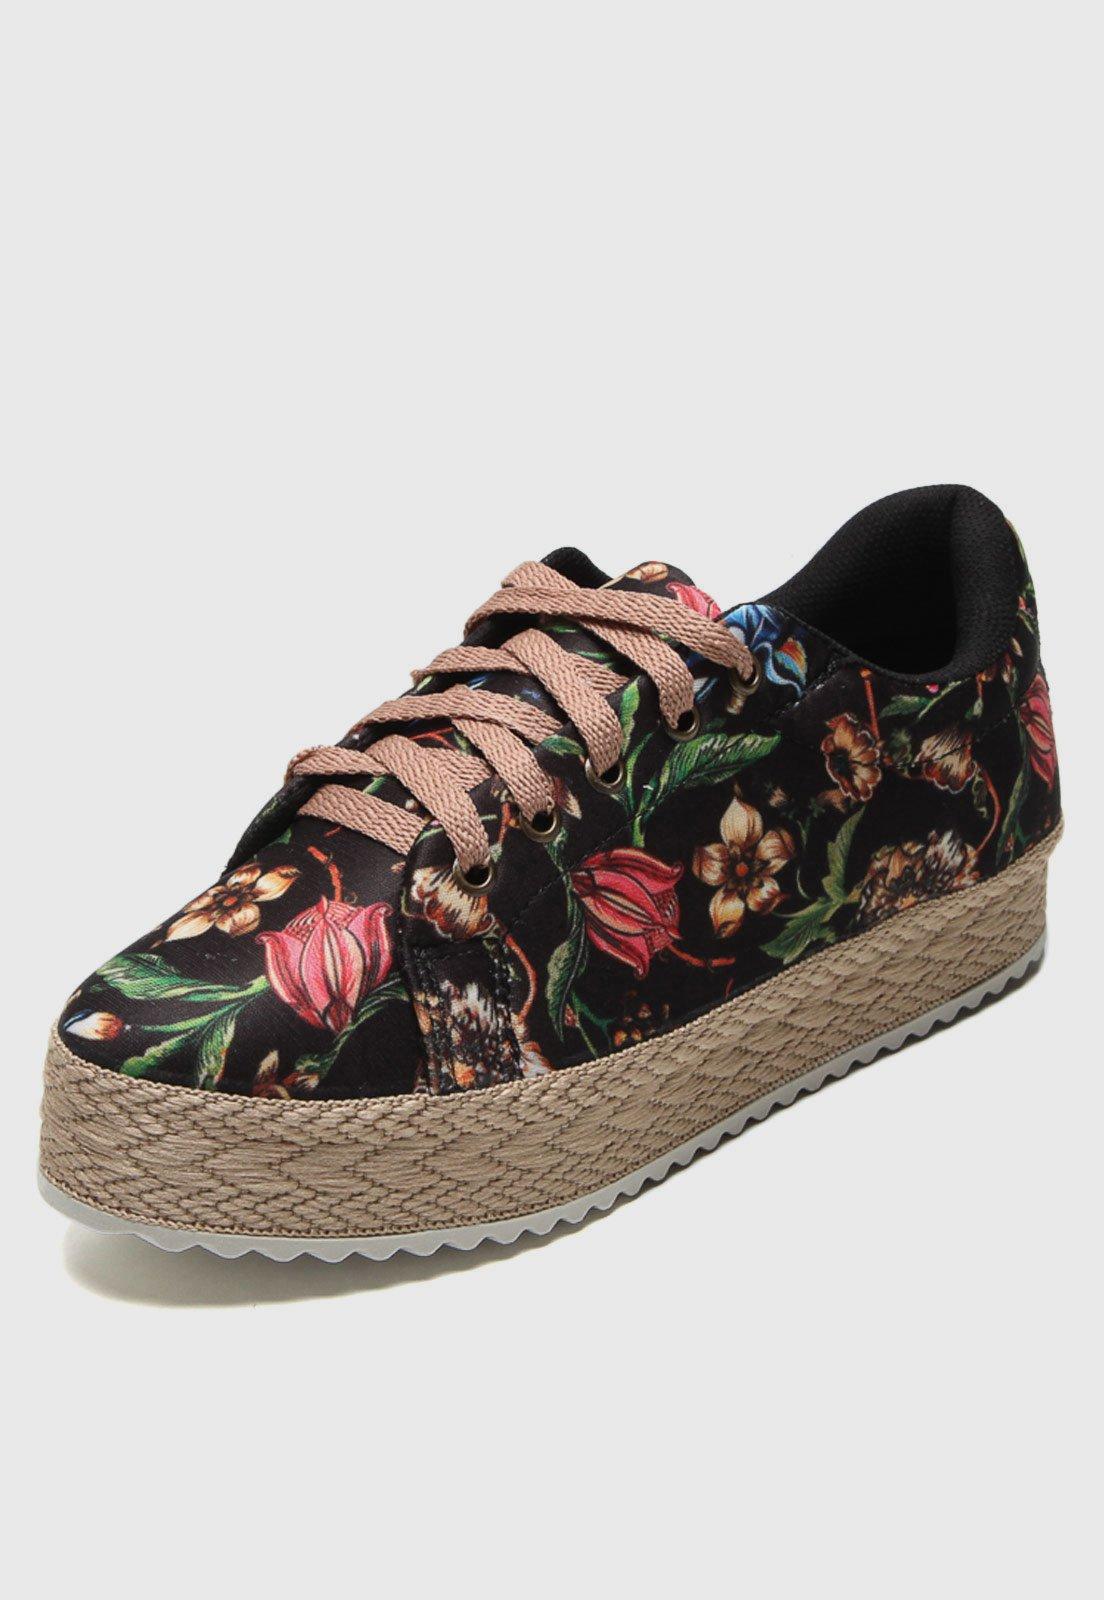 Tênis DAFITI SHOES Floral Preto - Marca DAFITI SHOES